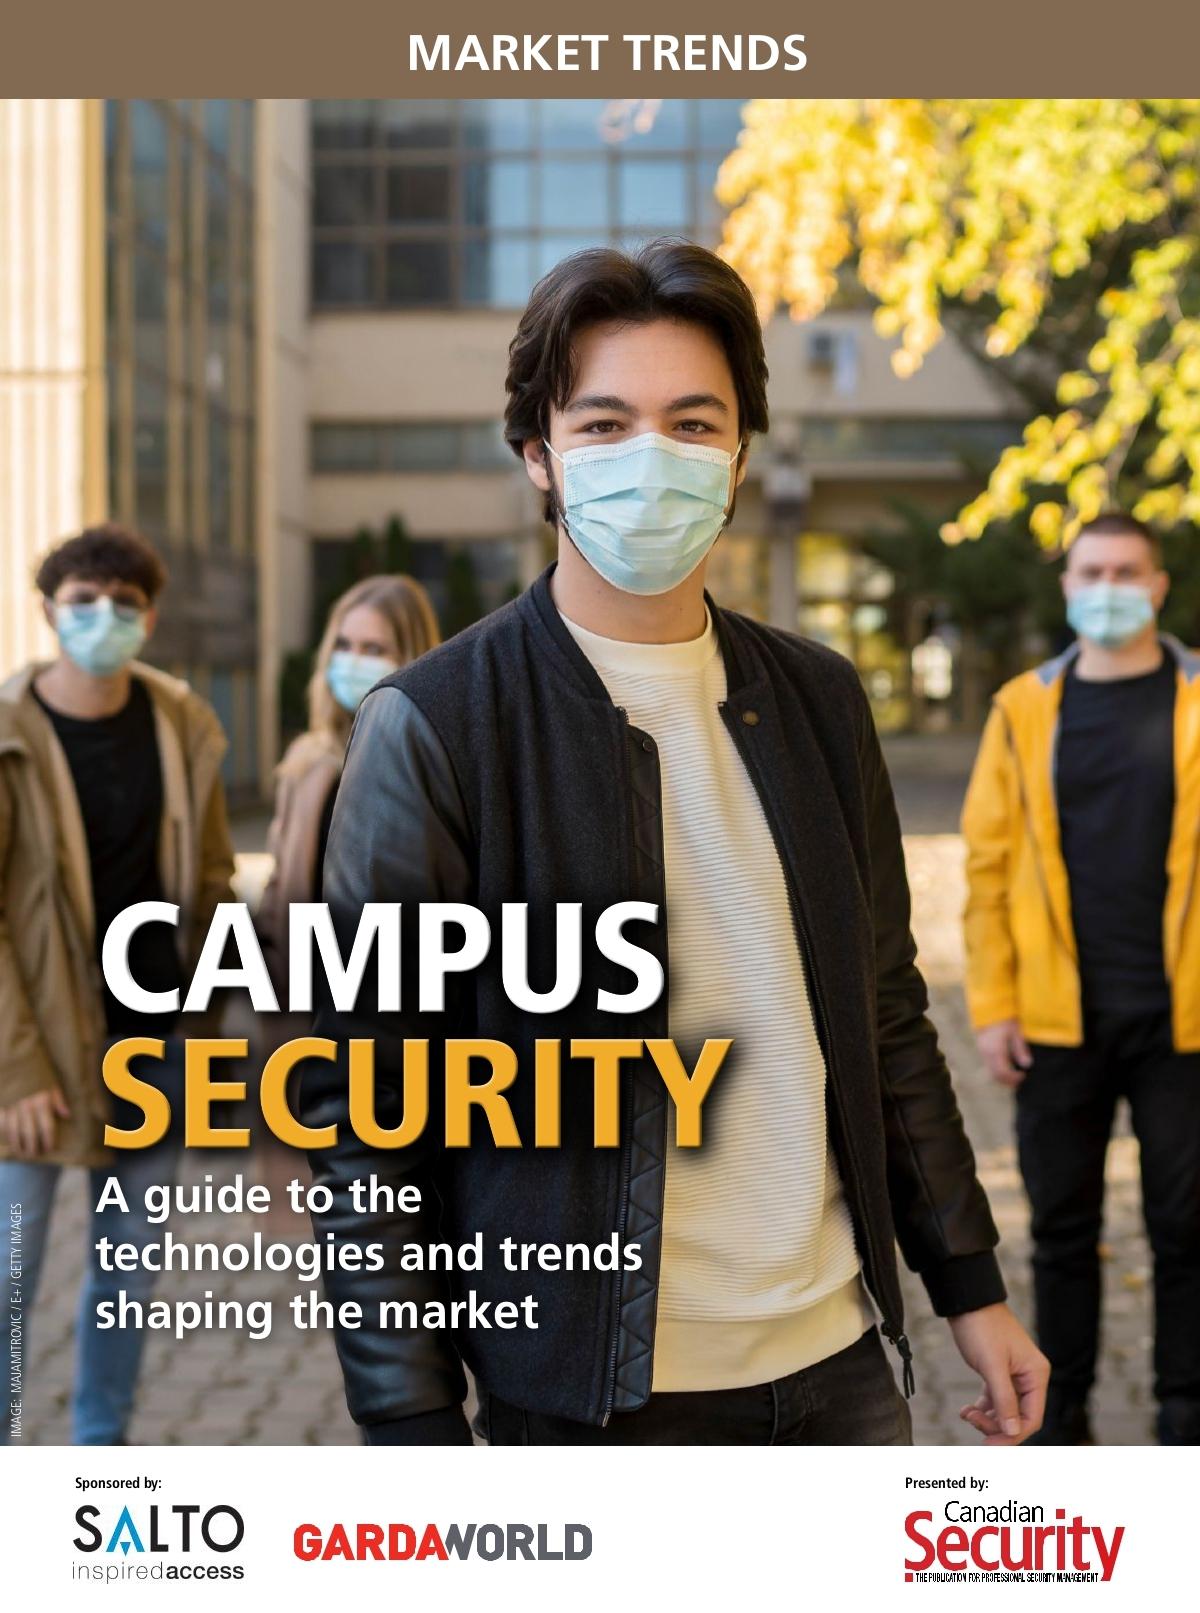 Campus Security Market Trends 2021